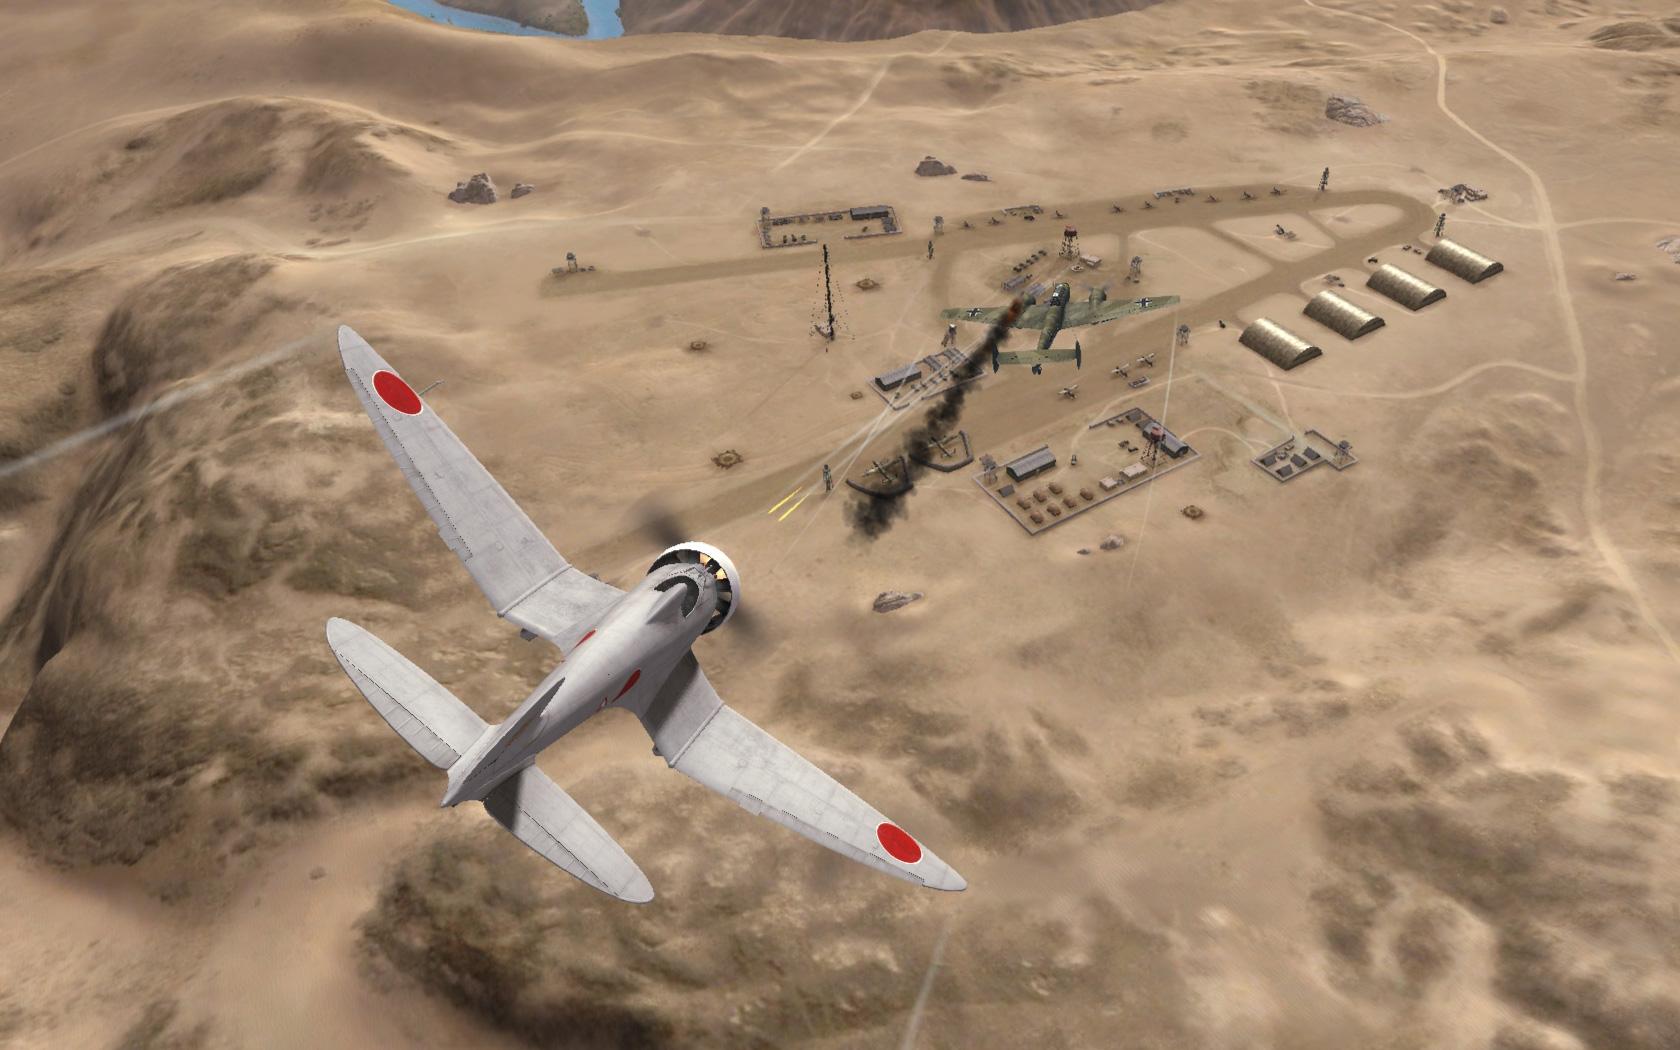 world_of_warplanes_screens_image_03.jpg